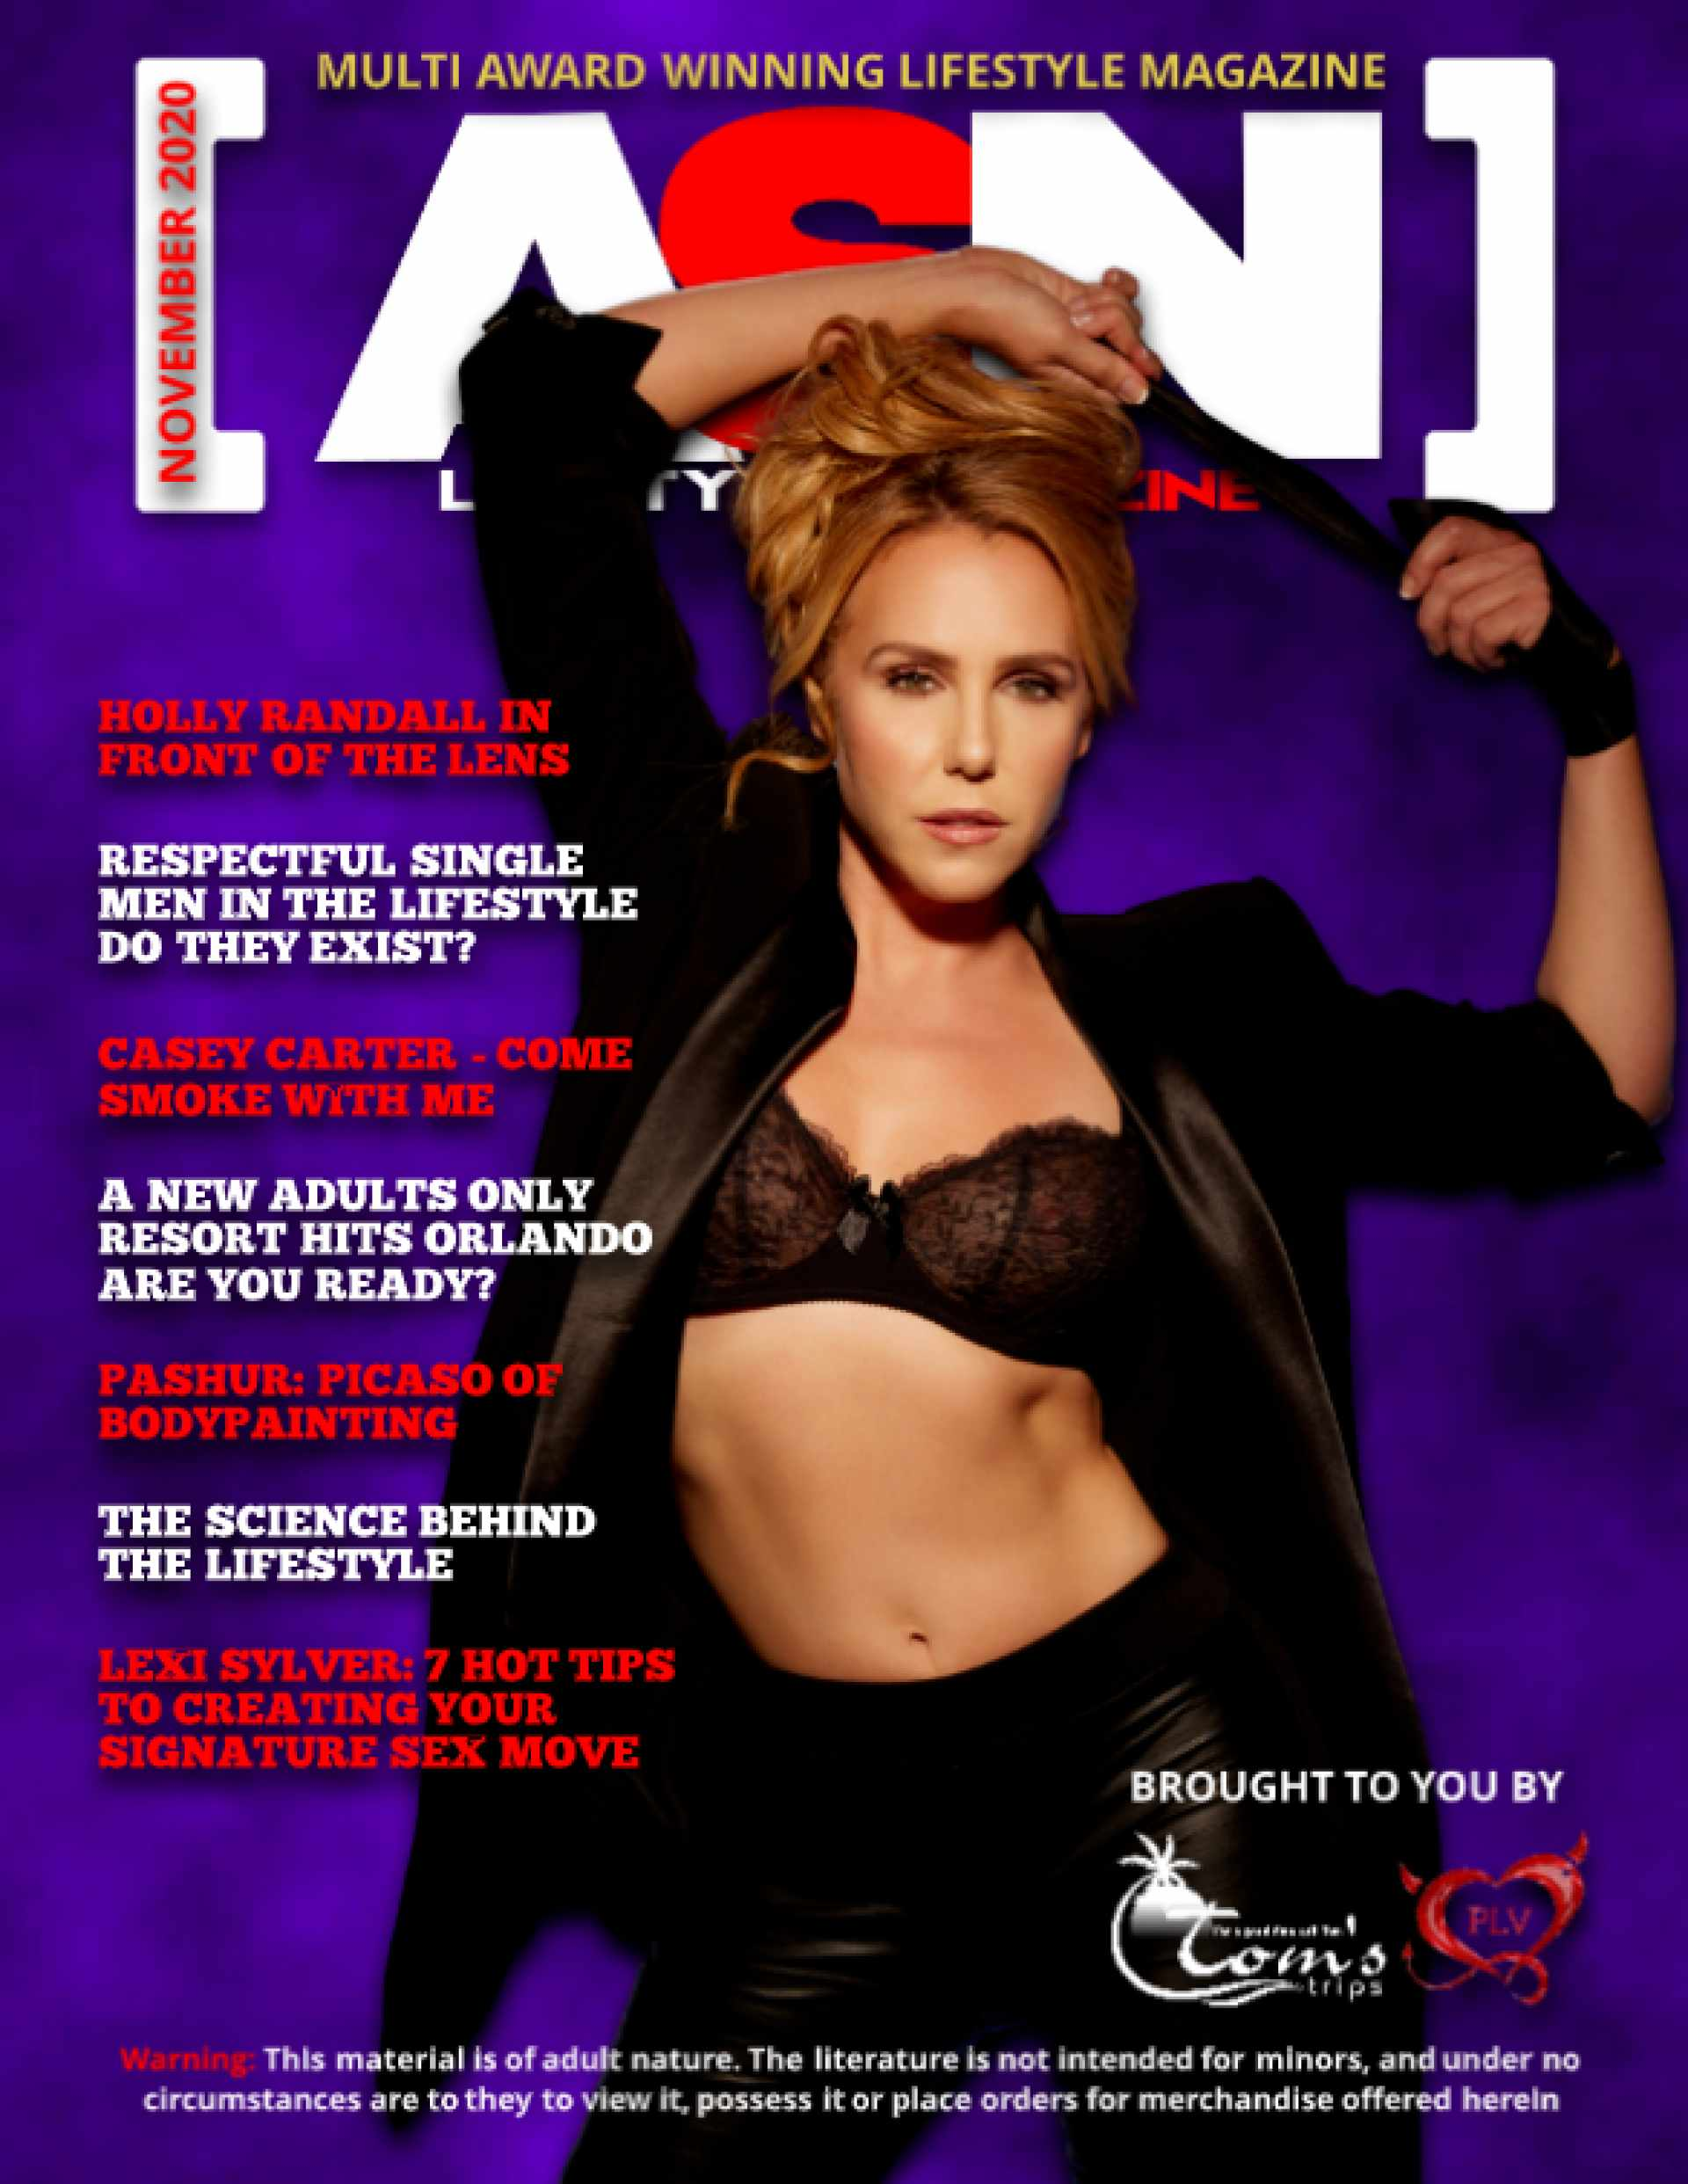 SDC ASN Lifestyle Magazine Nov 2020 Cover